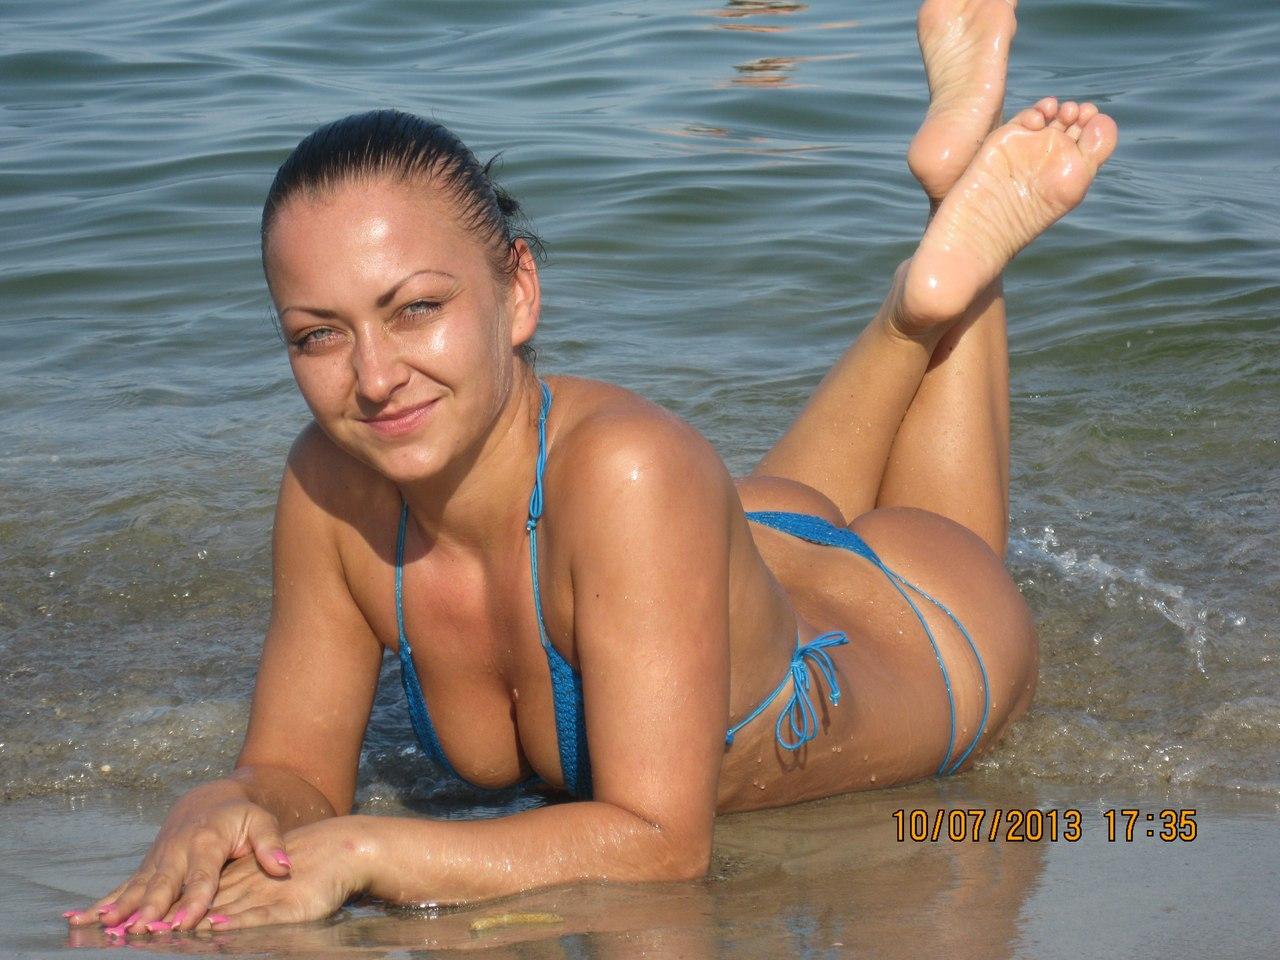 ru little nudist girls Chorvatsko naked deti)